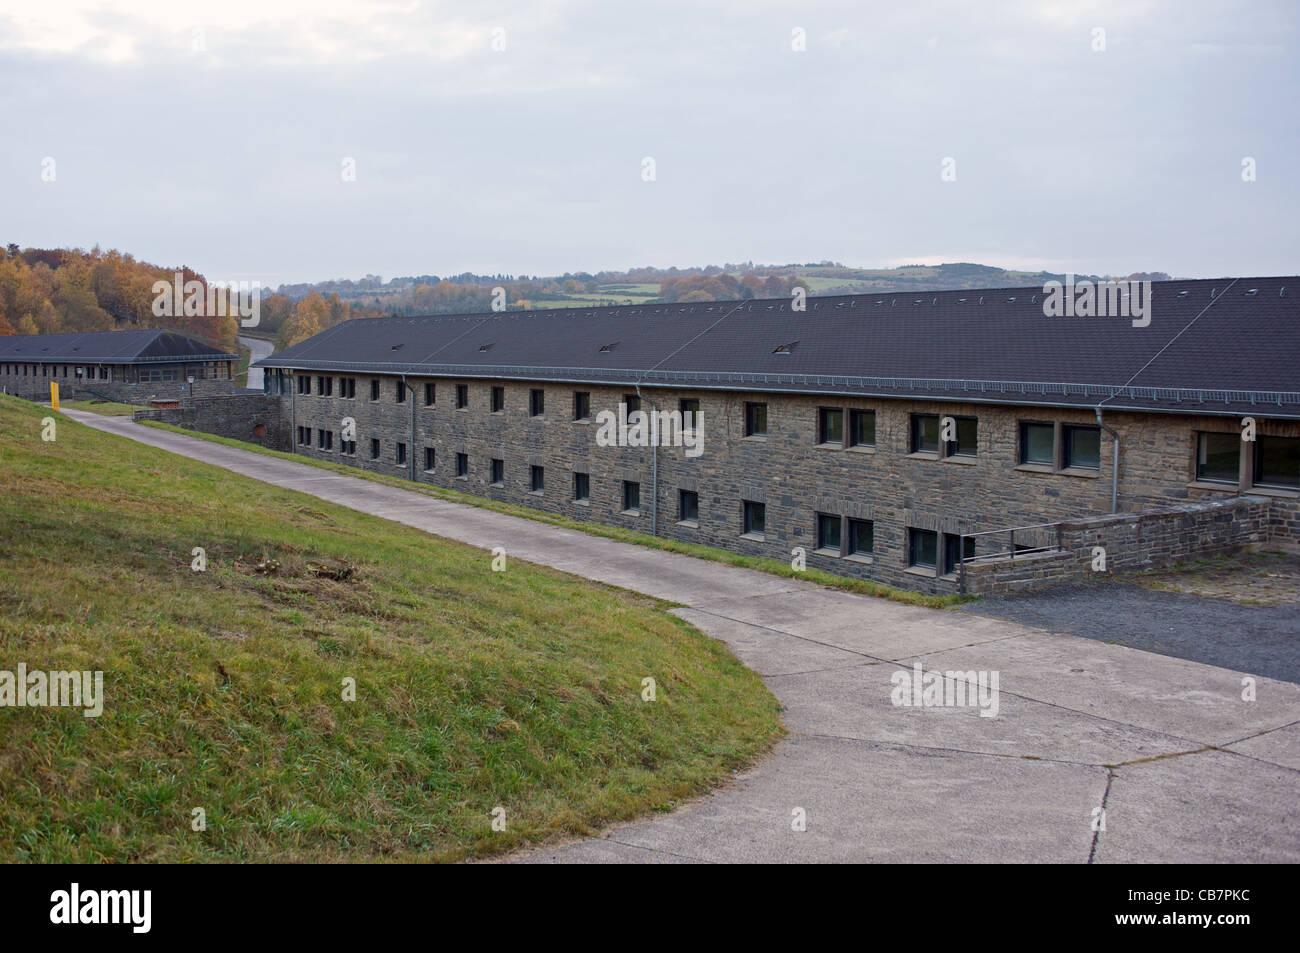 Comradeship-houses at Ordensburg Vogelsang, a former Nazi training camp, North Rhine-Westphalia, Germany. - Stock Image